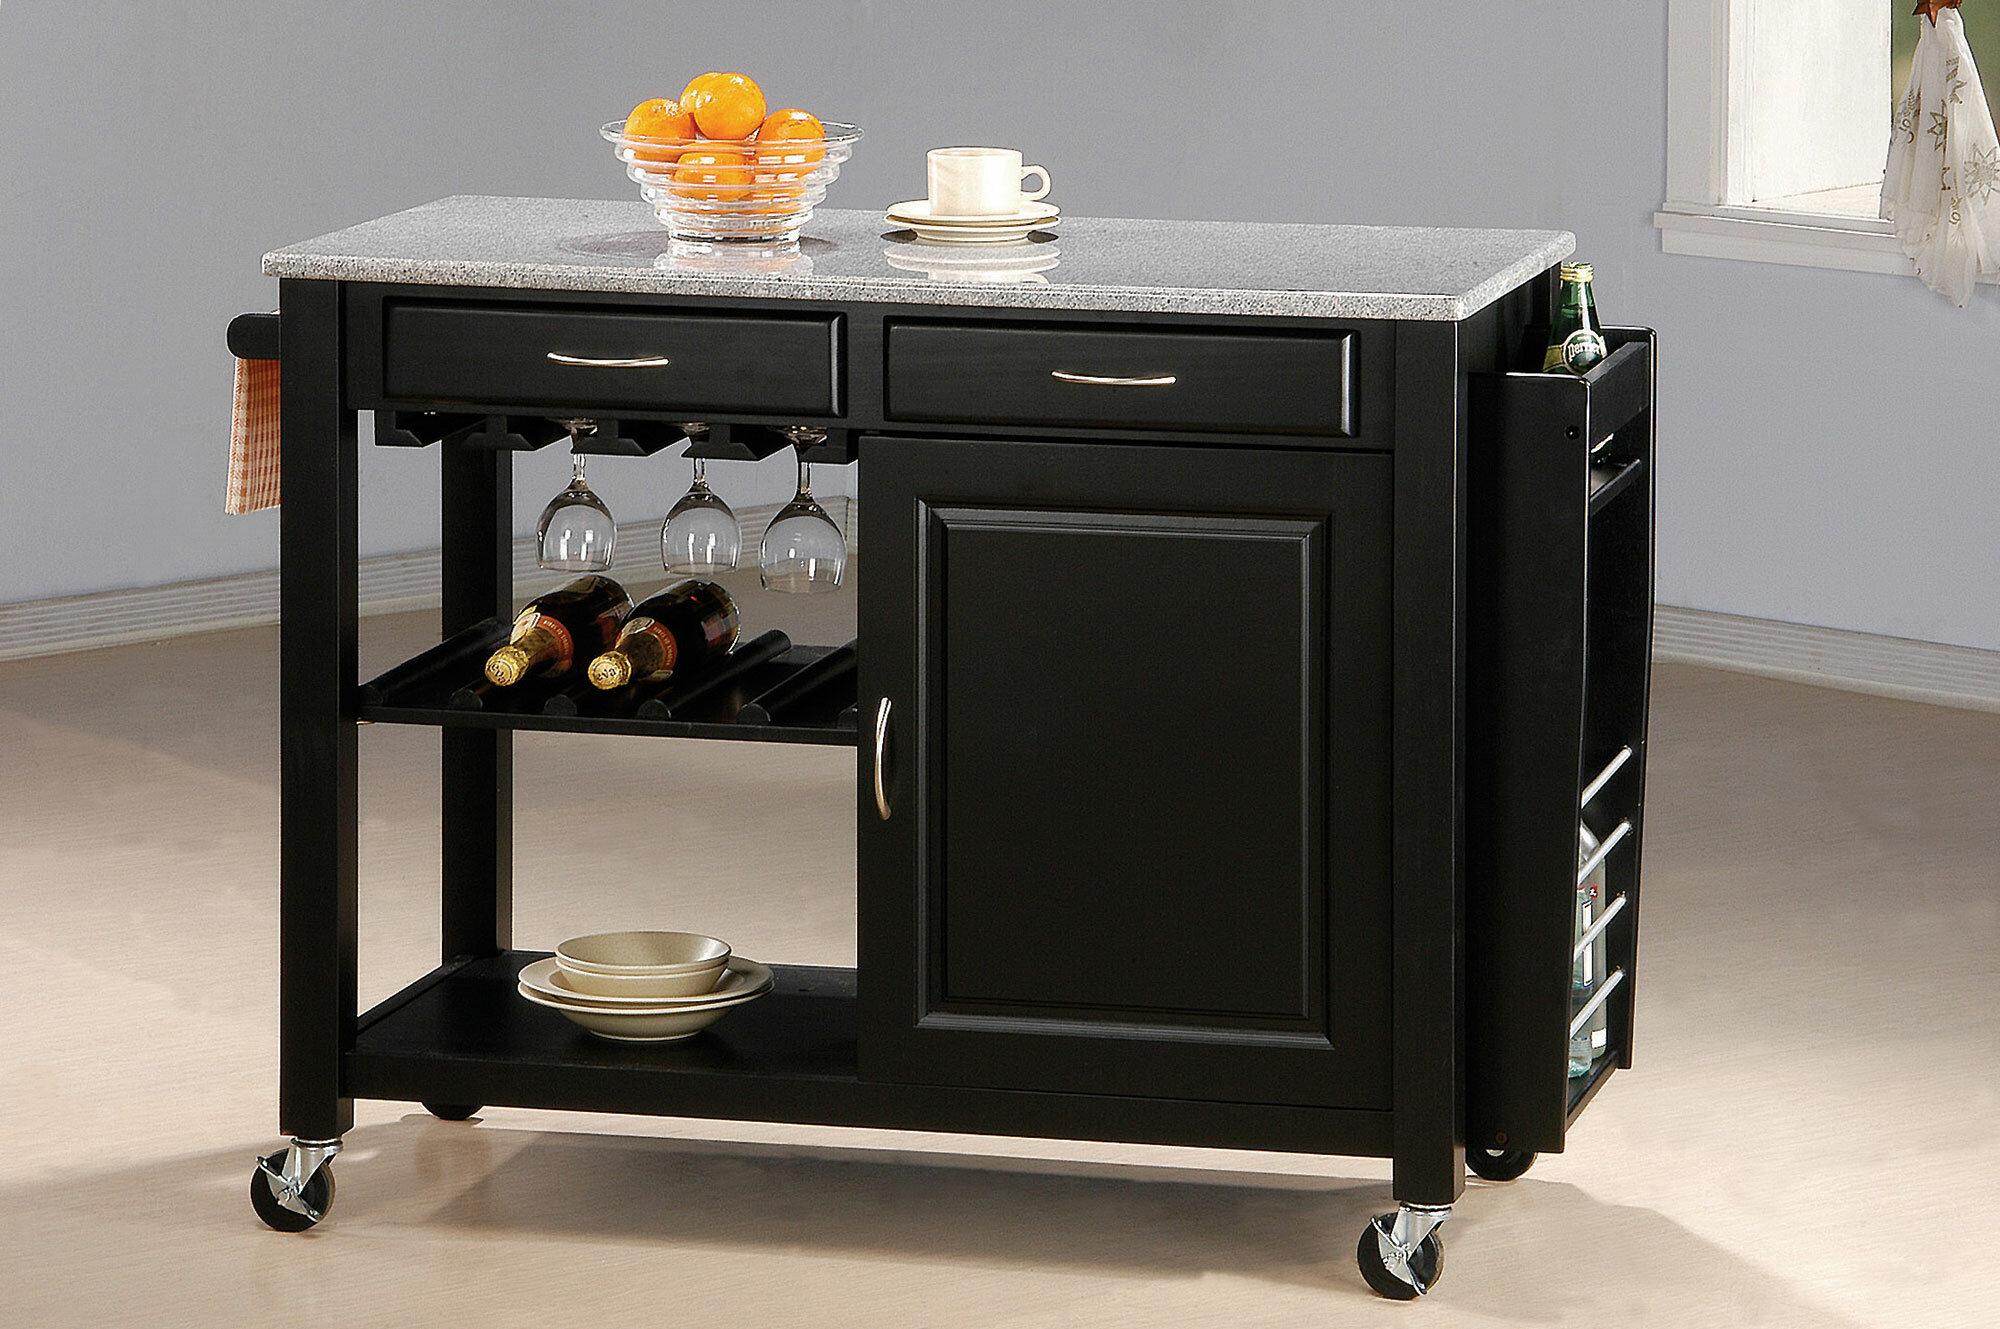 Superb Pastore Portable Kitchen Cart Granite Top Download Free Architecture Designs Scobabritishbridgeorg